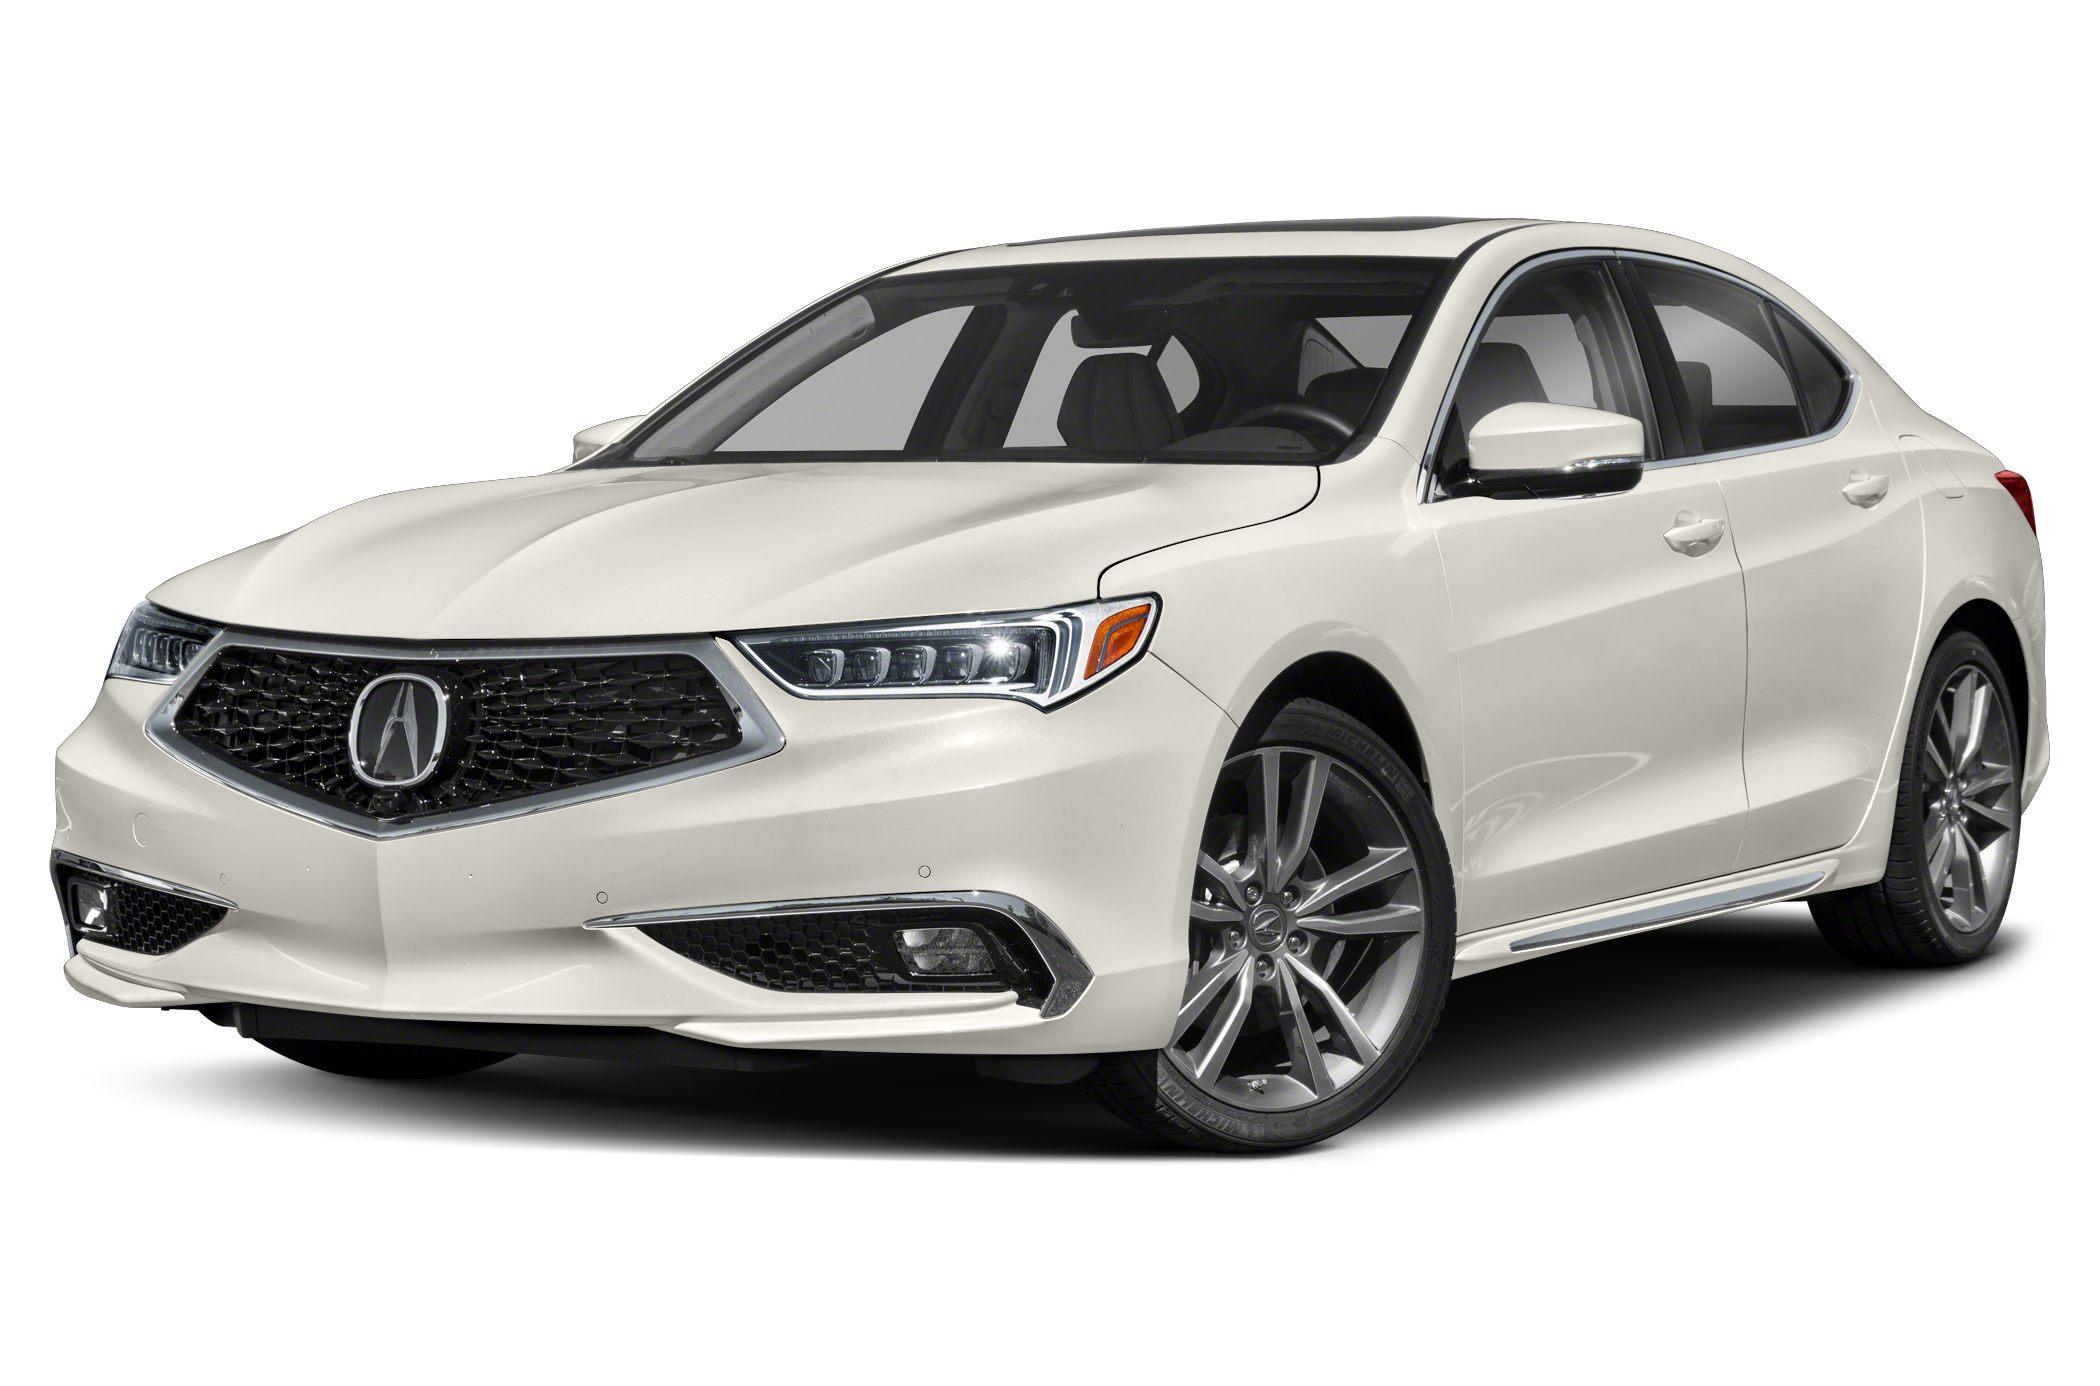 2020 Acura TLX 3.5L Advance Pkg 4dr SH-AWD Sedan